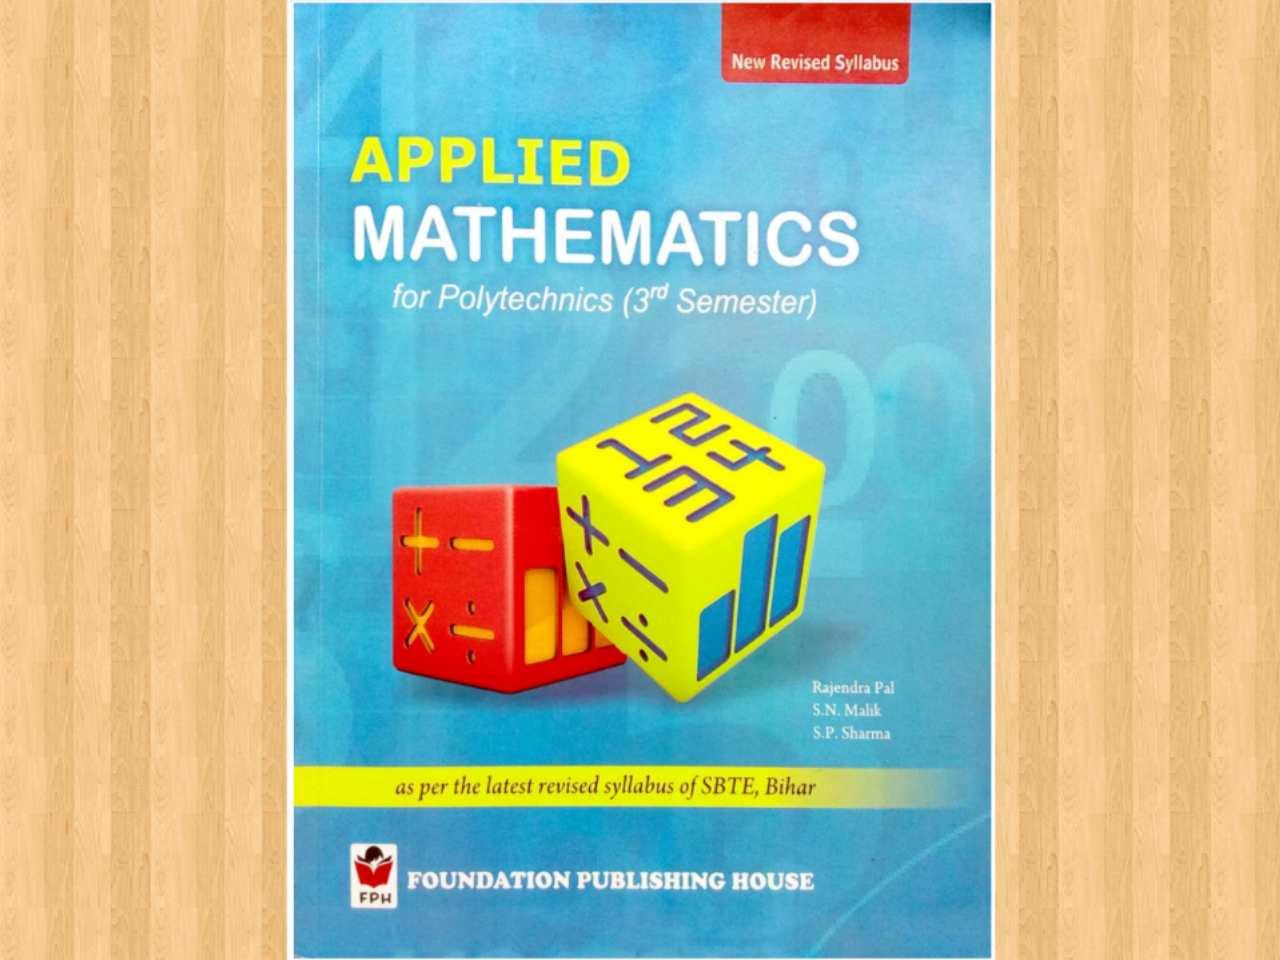 Applied Mathematics book download free